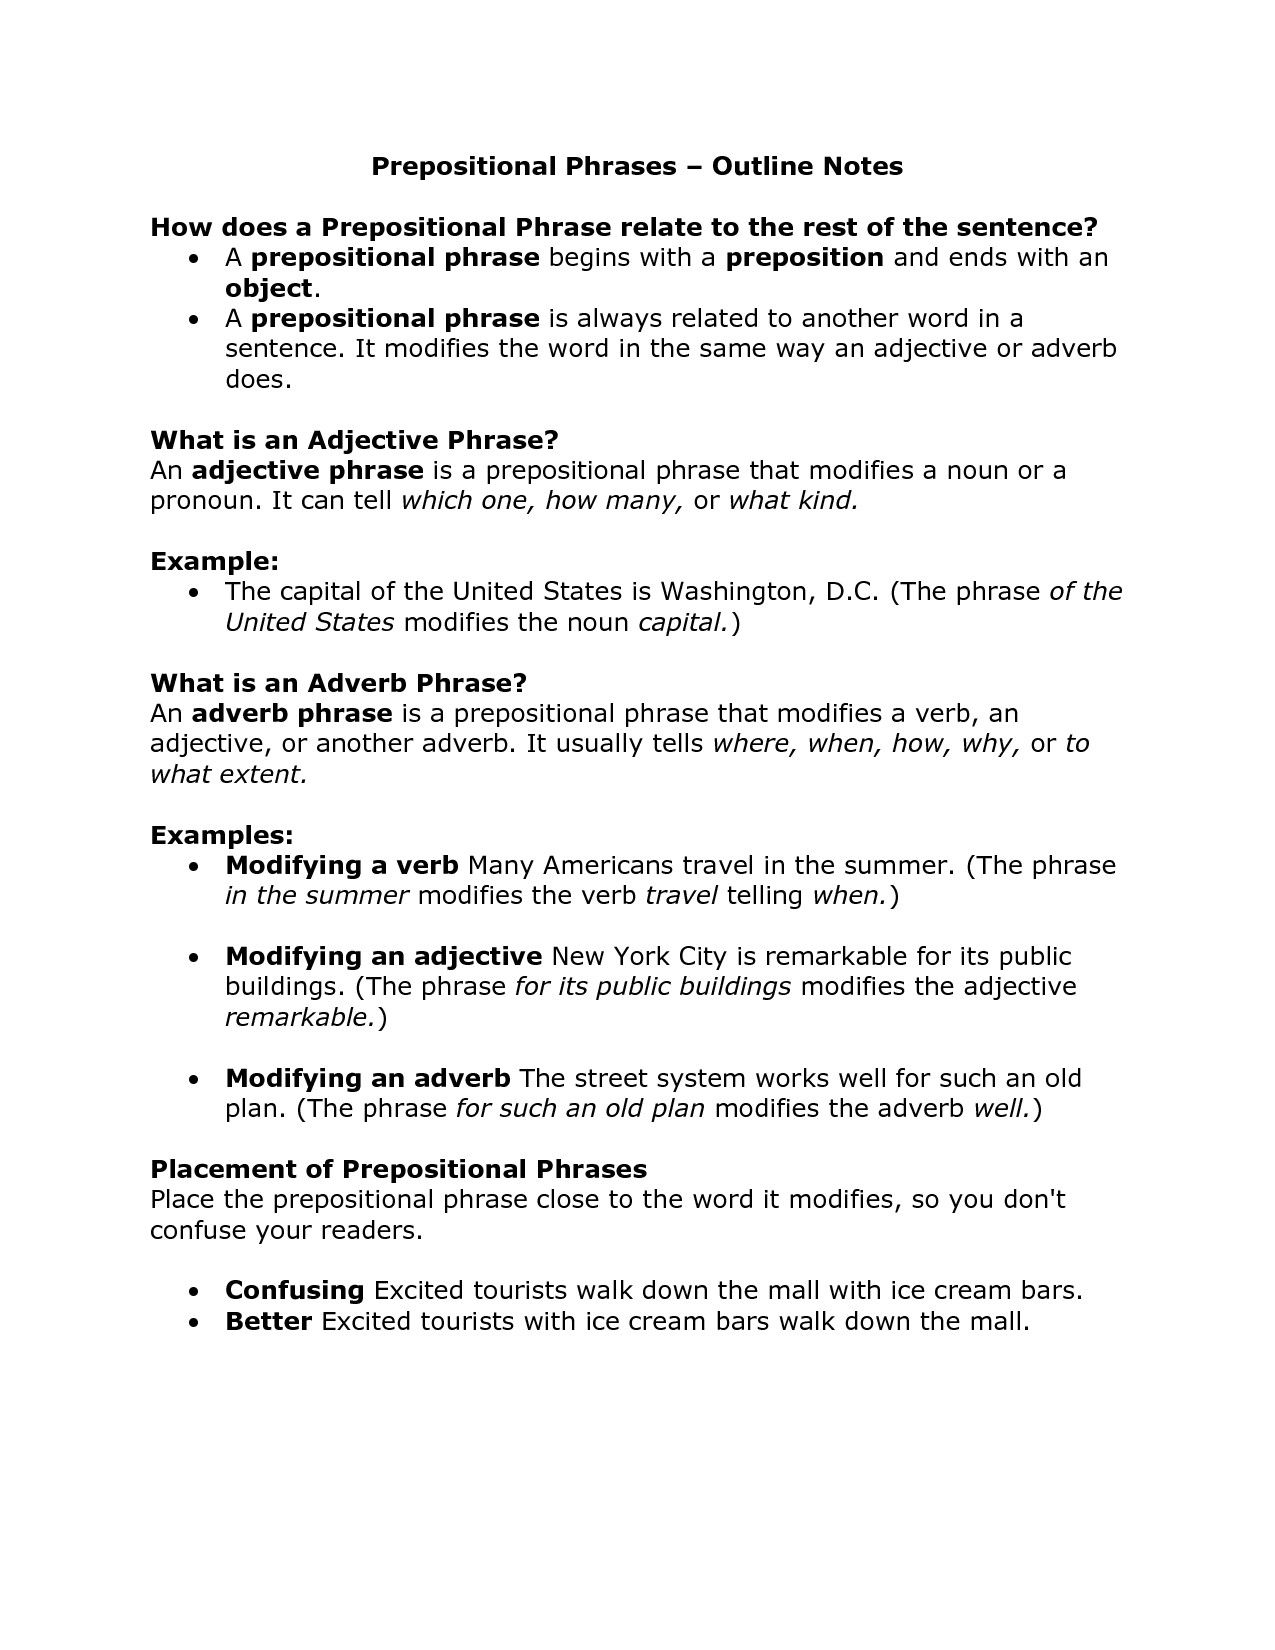 4 Worksheet Free Grammar Worksheets Fifth Grade 5 Adjectives Adverbs  Prepositional Phrases Pr...   Prepositional phrases [ 1650 x 1275 Pixel ]